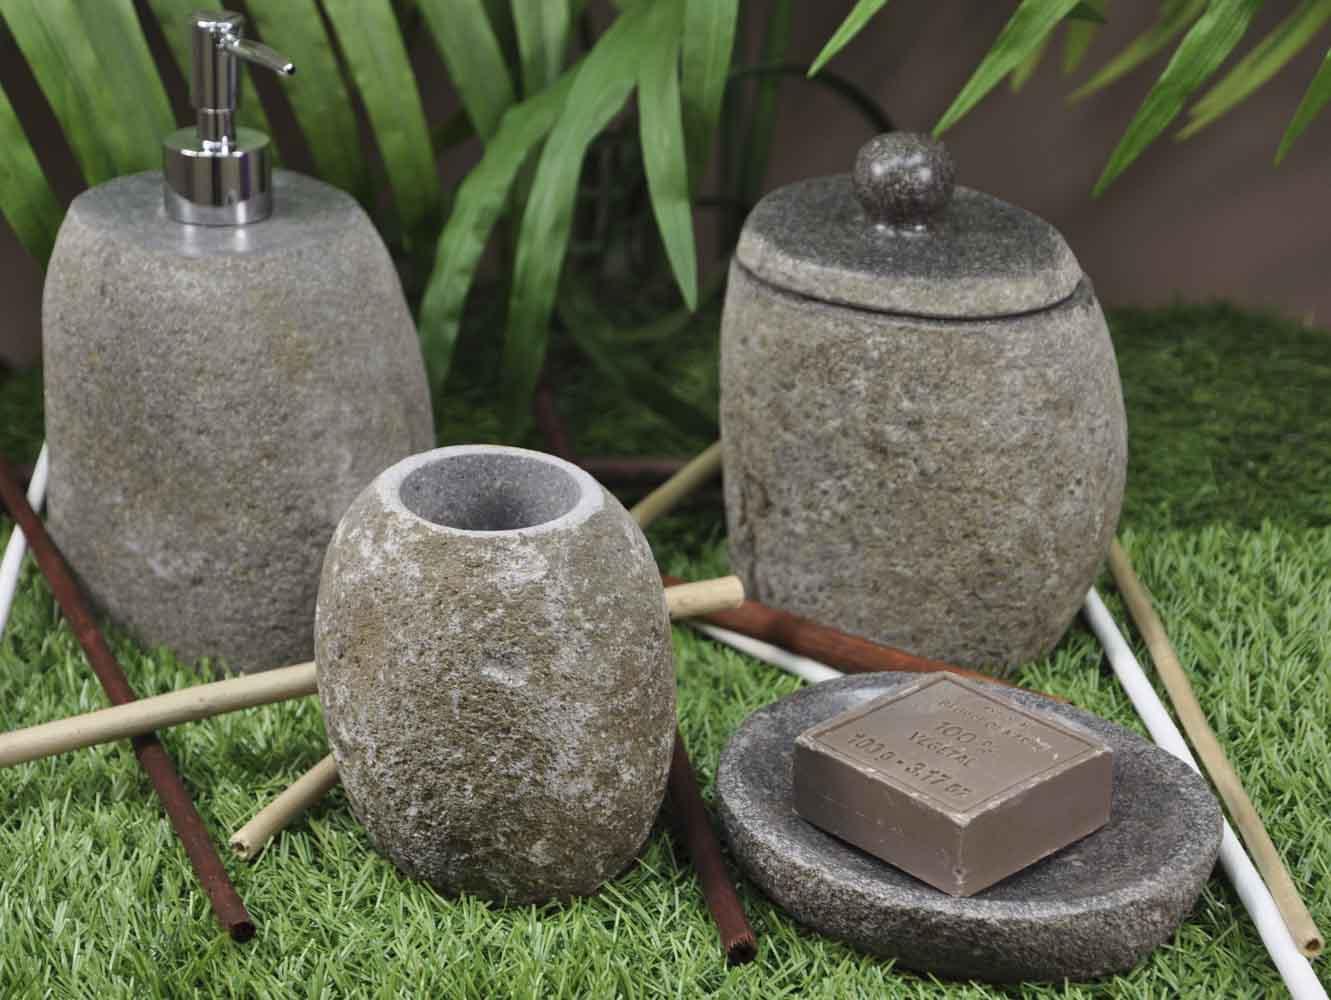 gobelet de salle de bain gobelet en pierre naturelle. Black Bedroom Furniture Sets. Home Design Ideas